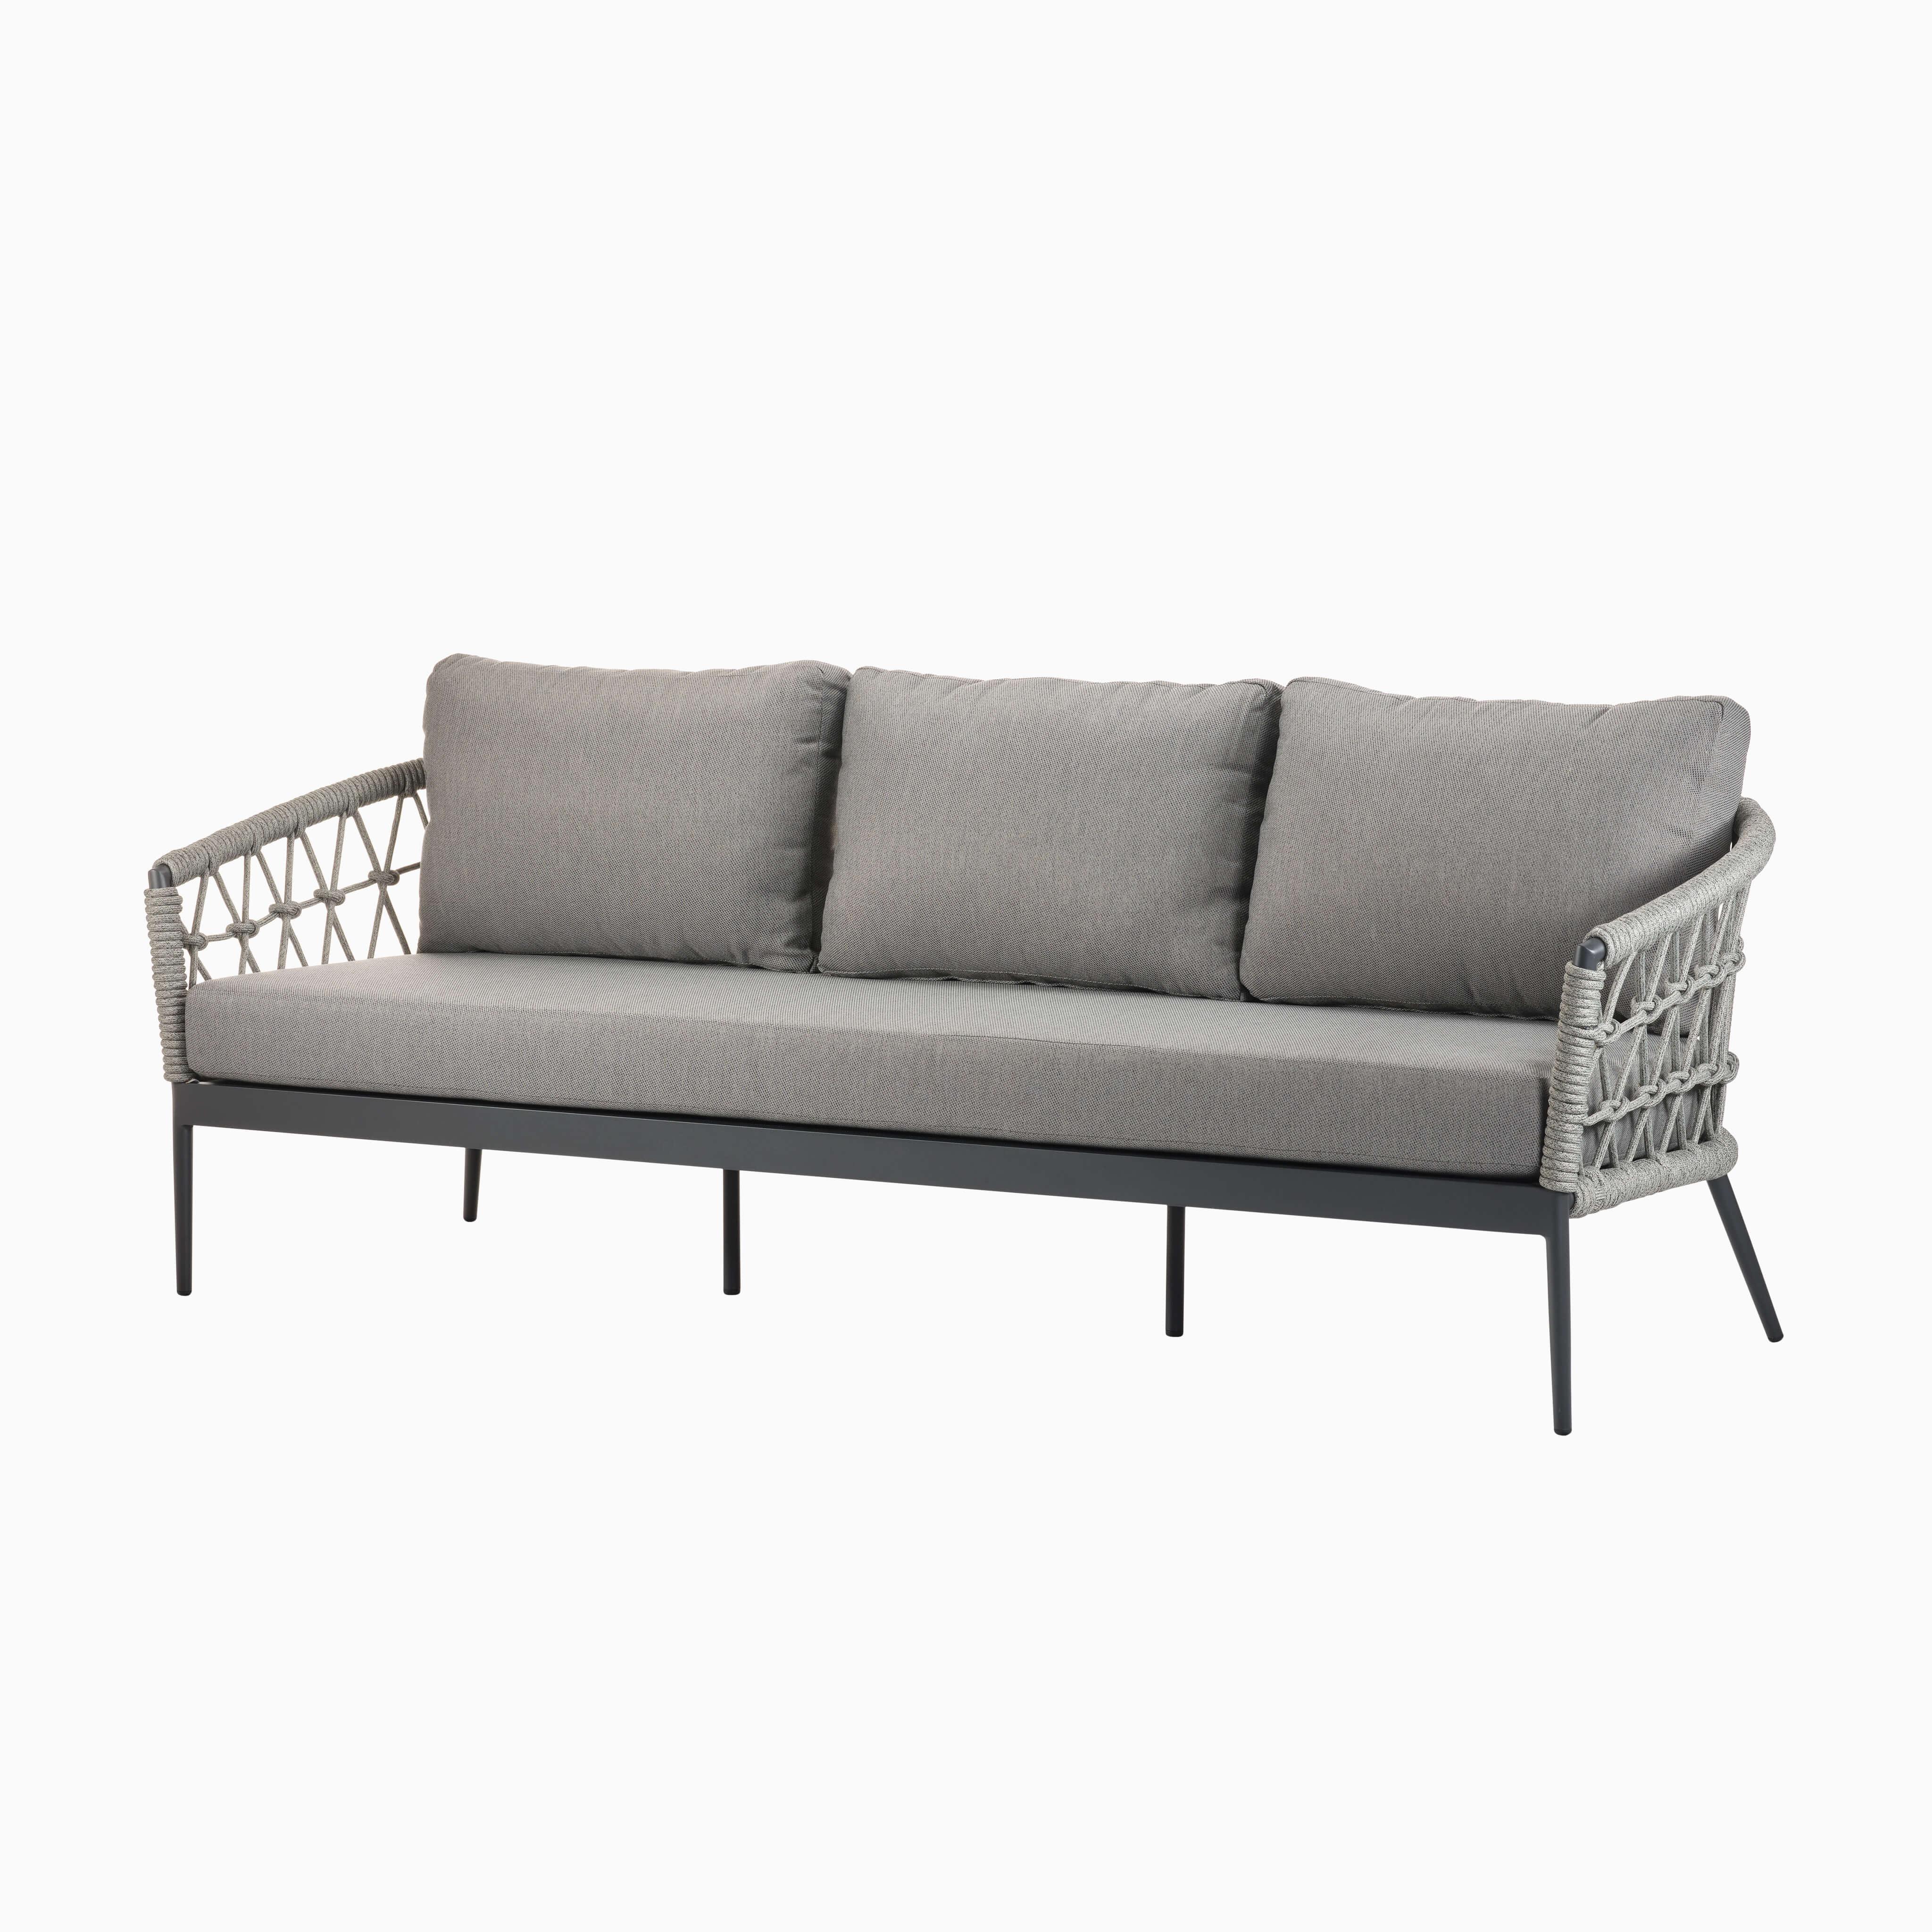 3-Sitzer Sofa Kapstadt - Fischnetzgeflecht - Silbergrau